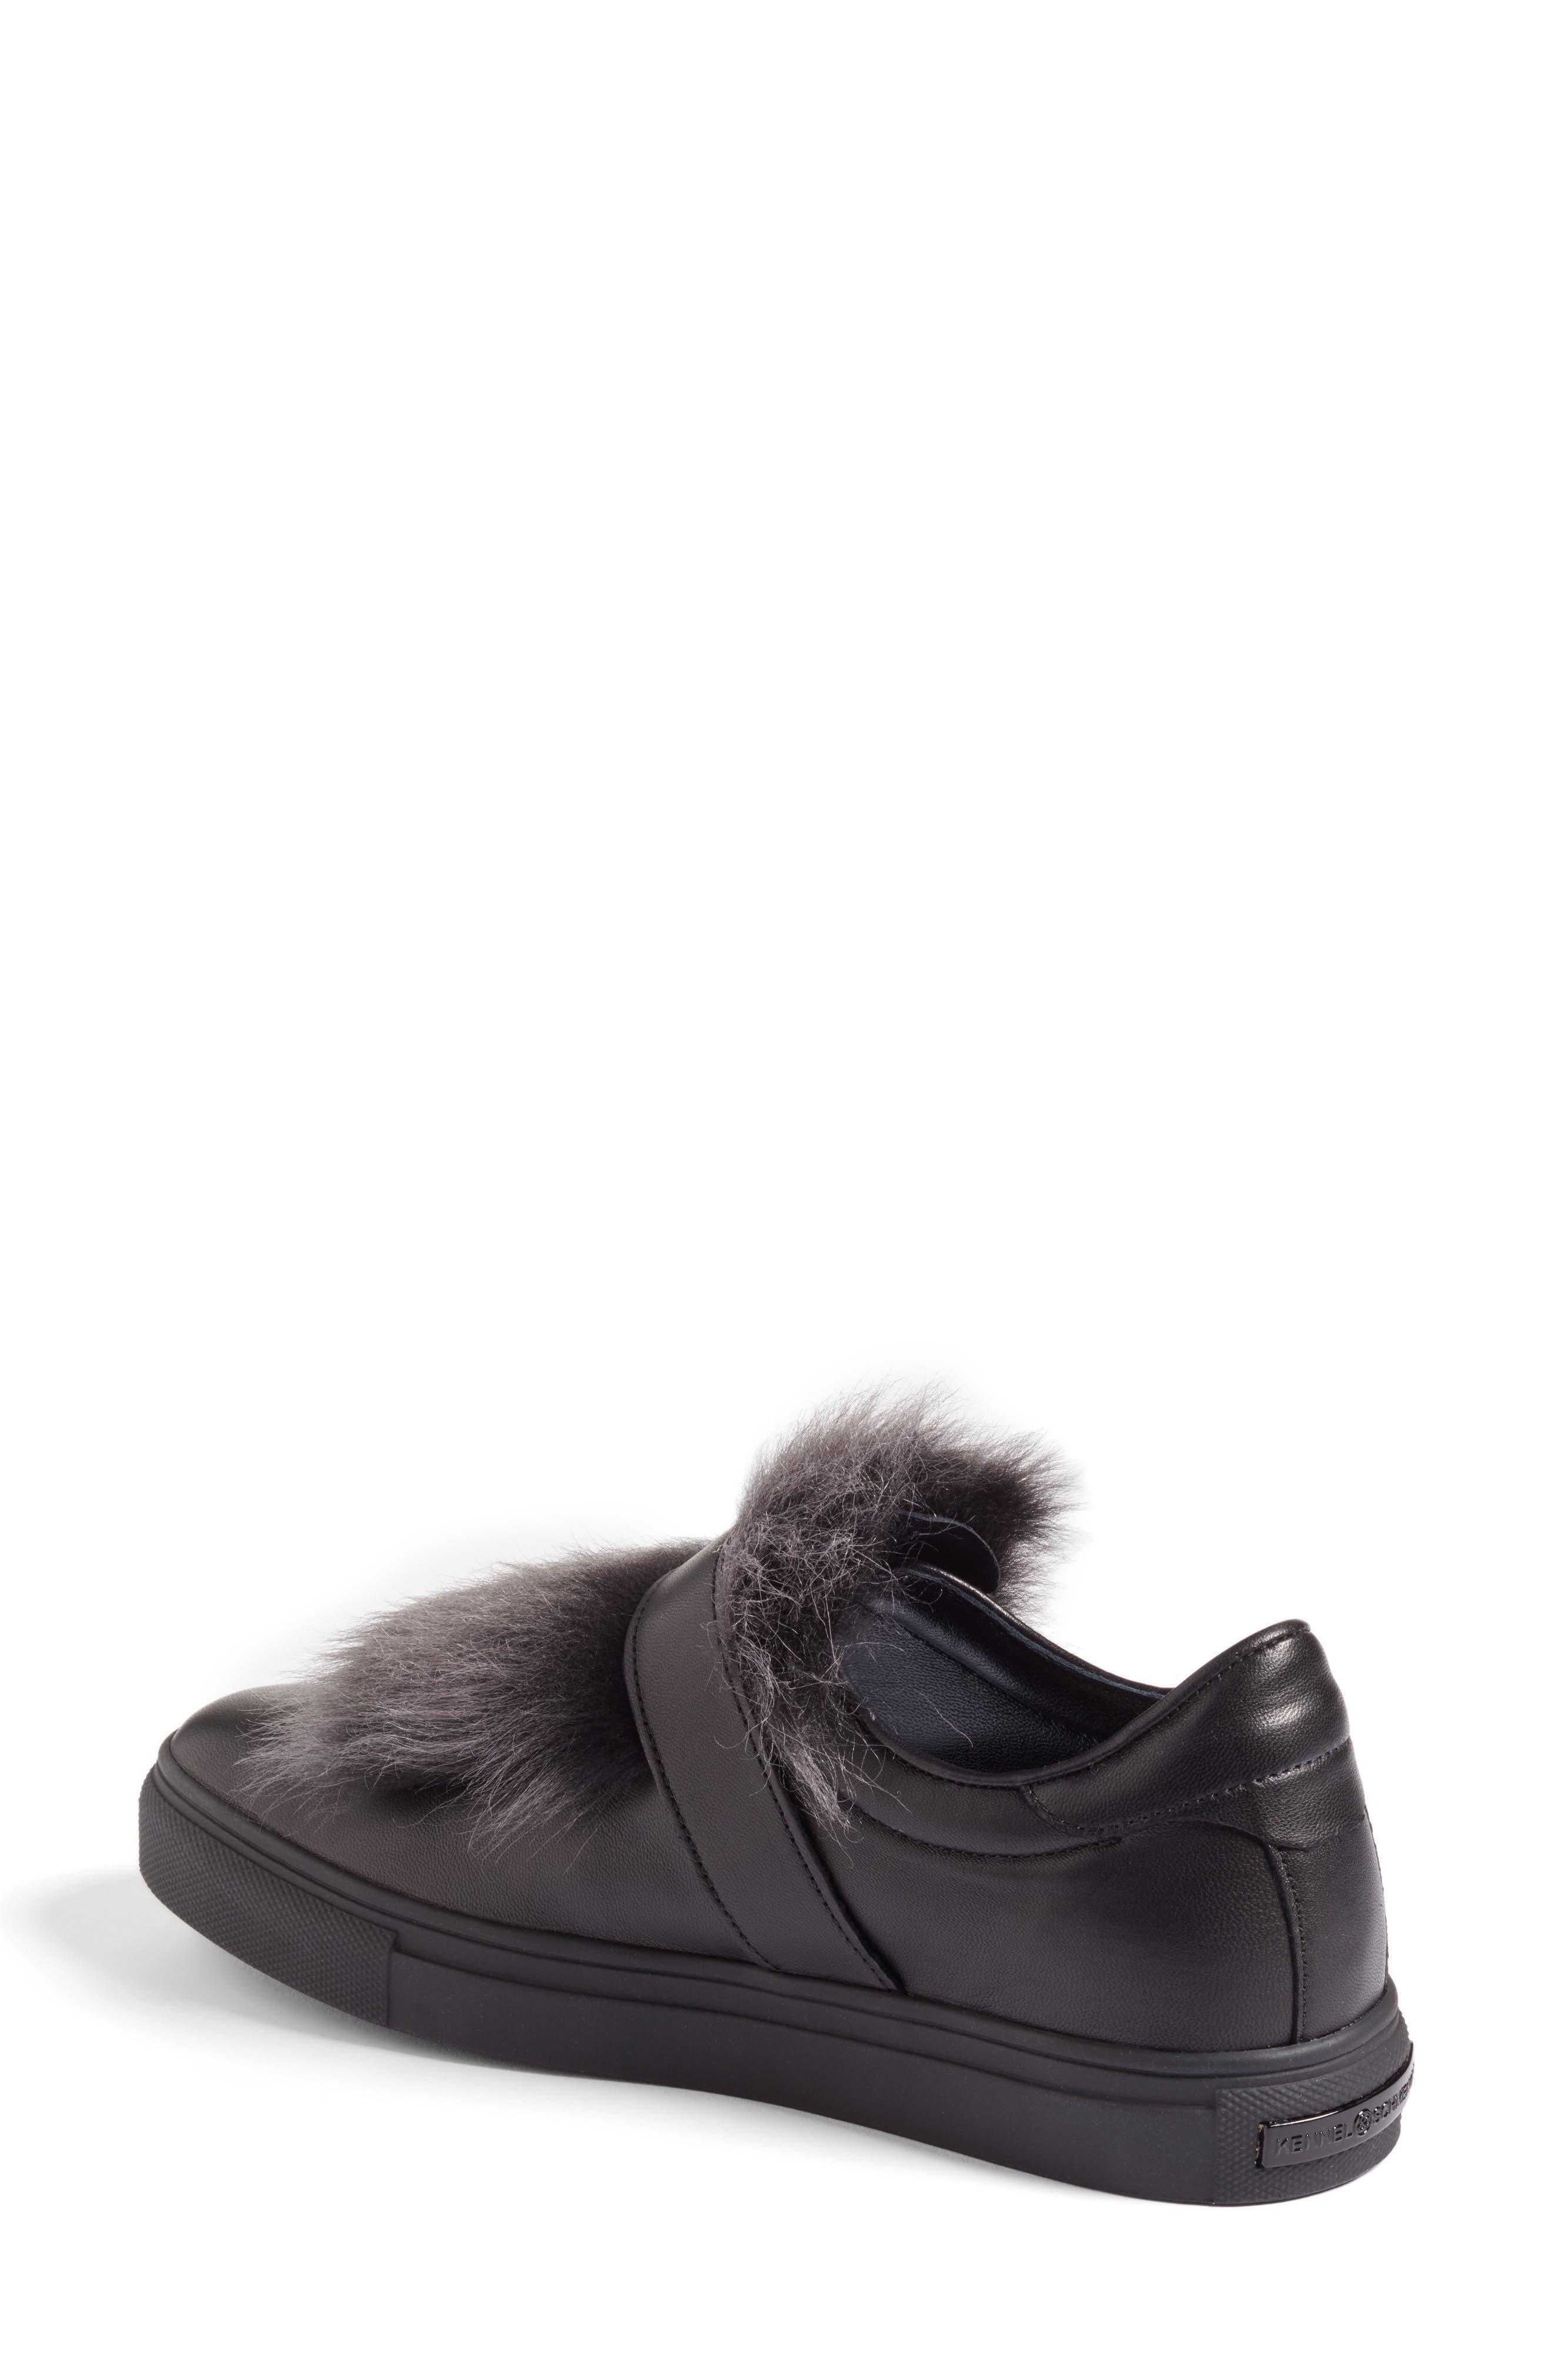 Kennel & Schmenger Basket Slip-On Sneaker with Genuine Shearling Trim,                             Alternate thumbnail 2, color,                             Black